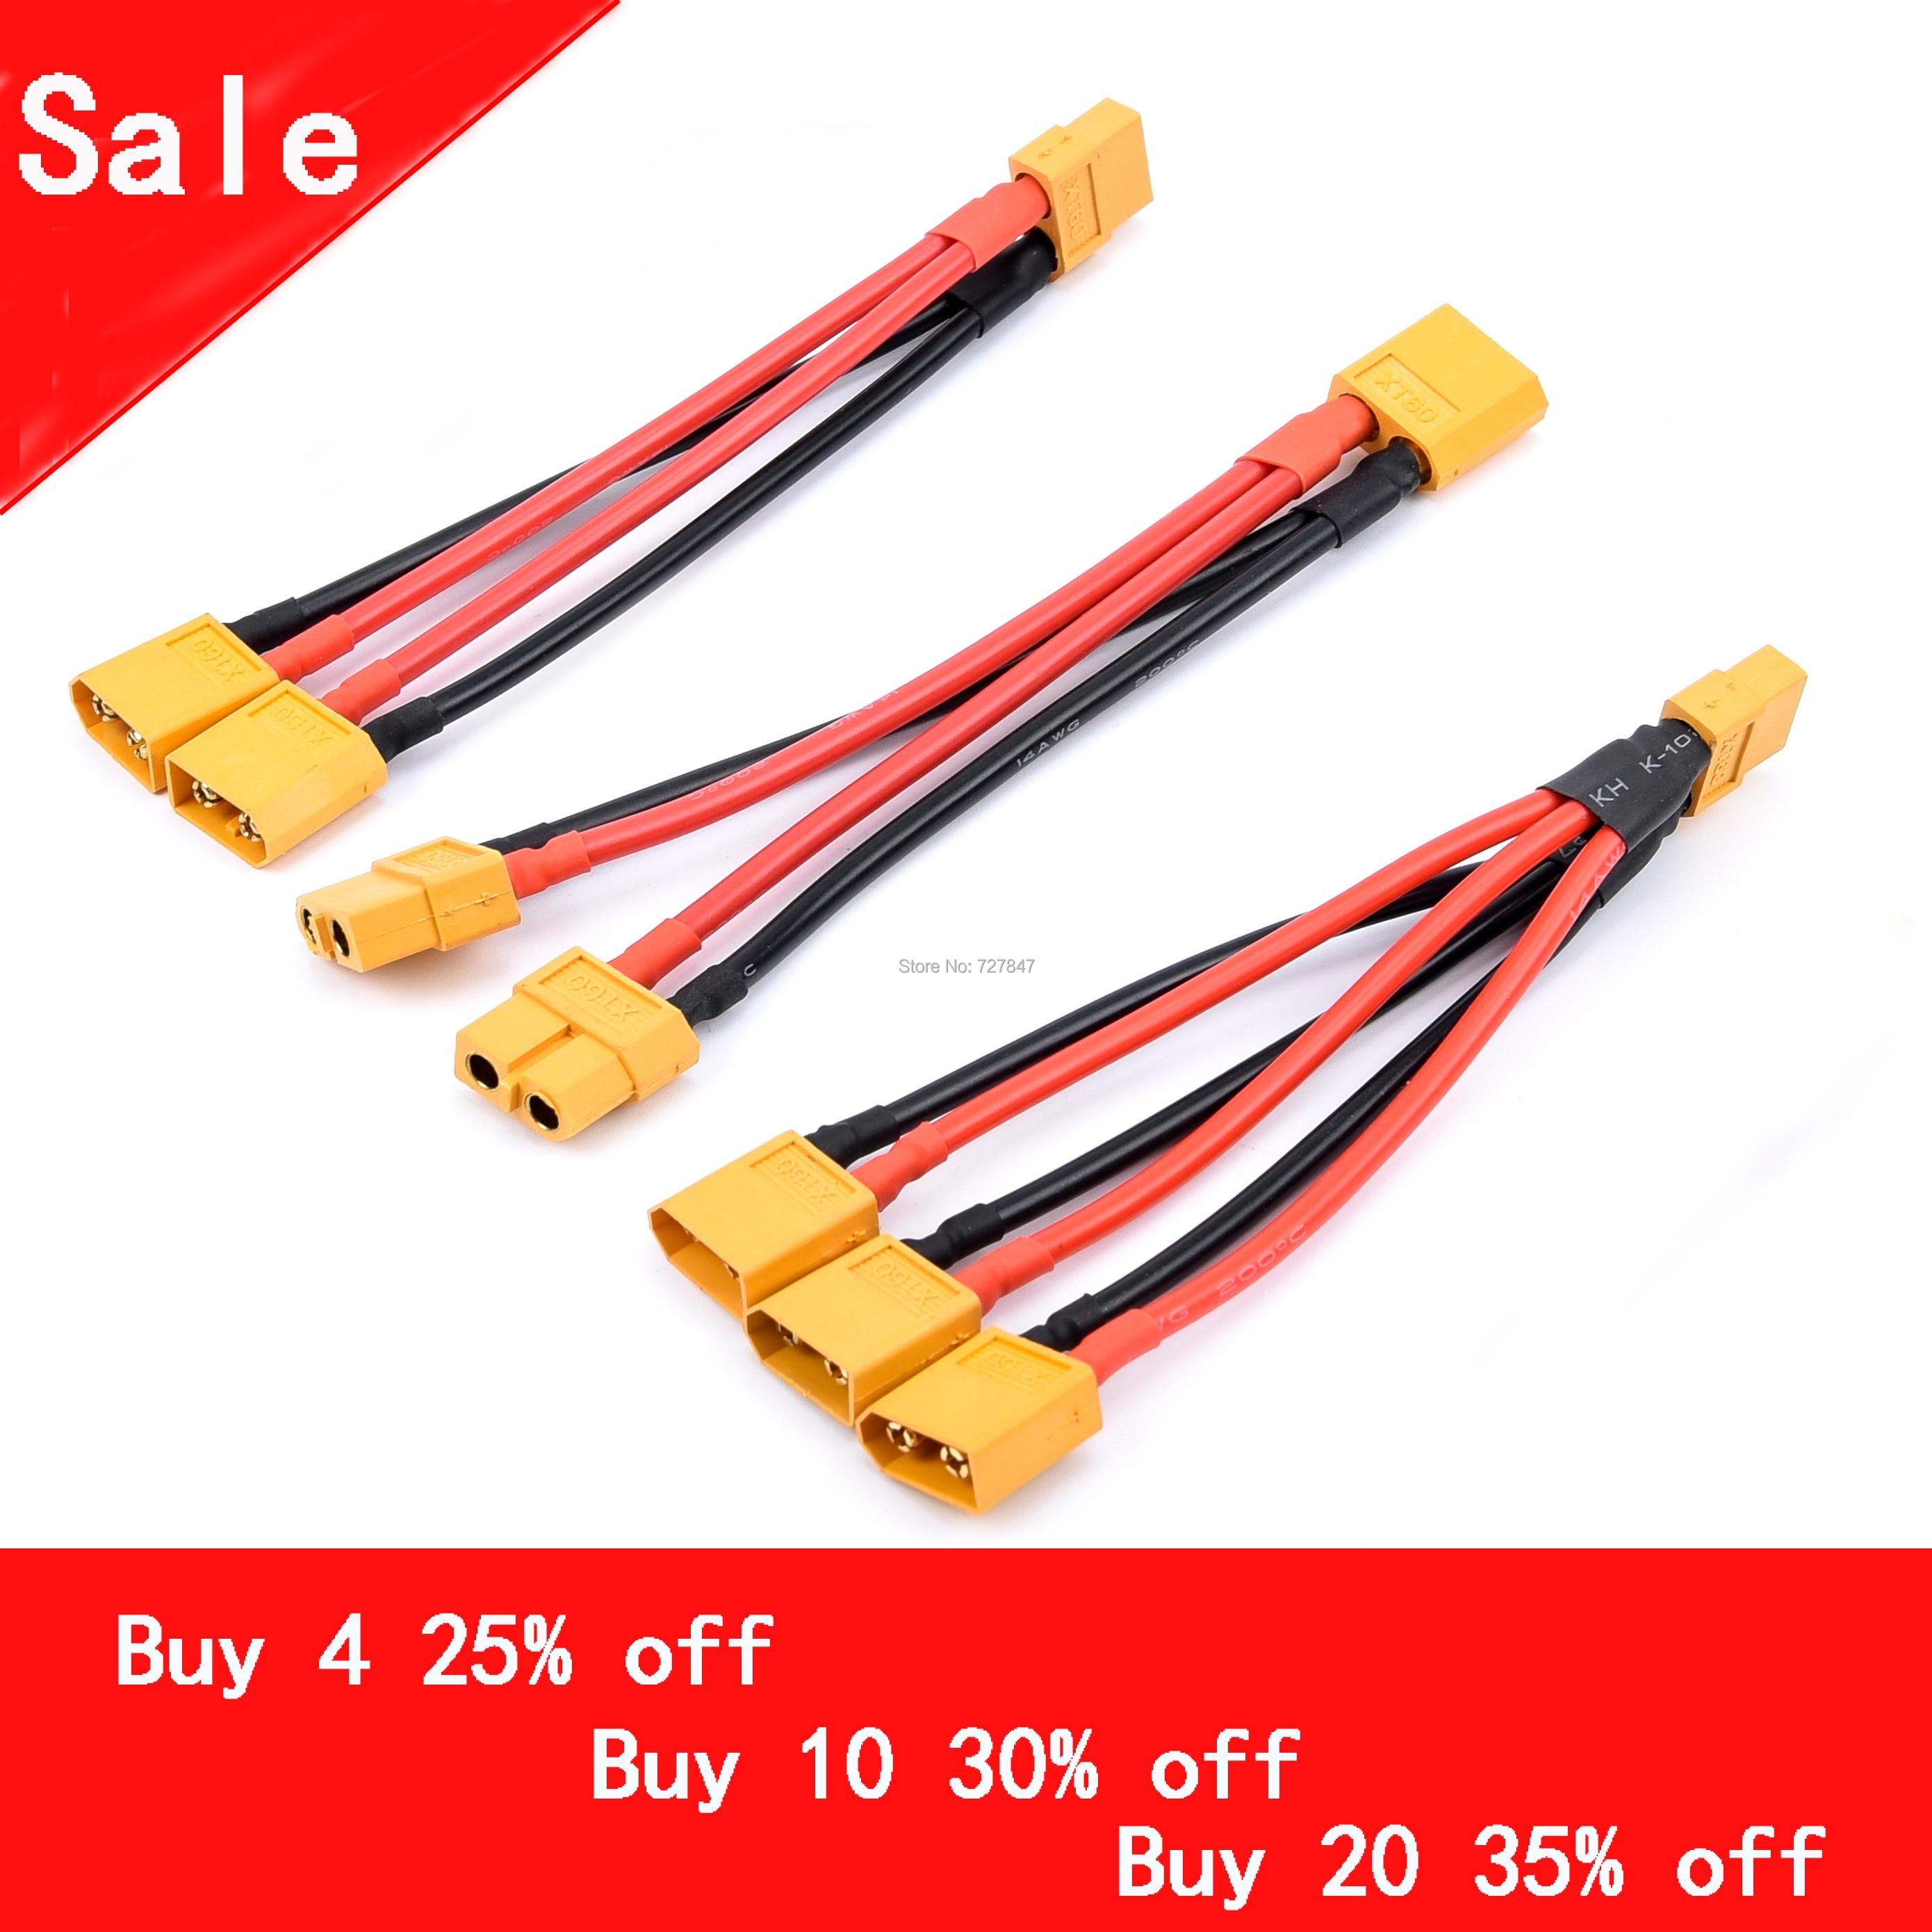 Conector de batería paralelo XT60, Cable macho/hembra, doble extensión, divisor Y/Cable de...